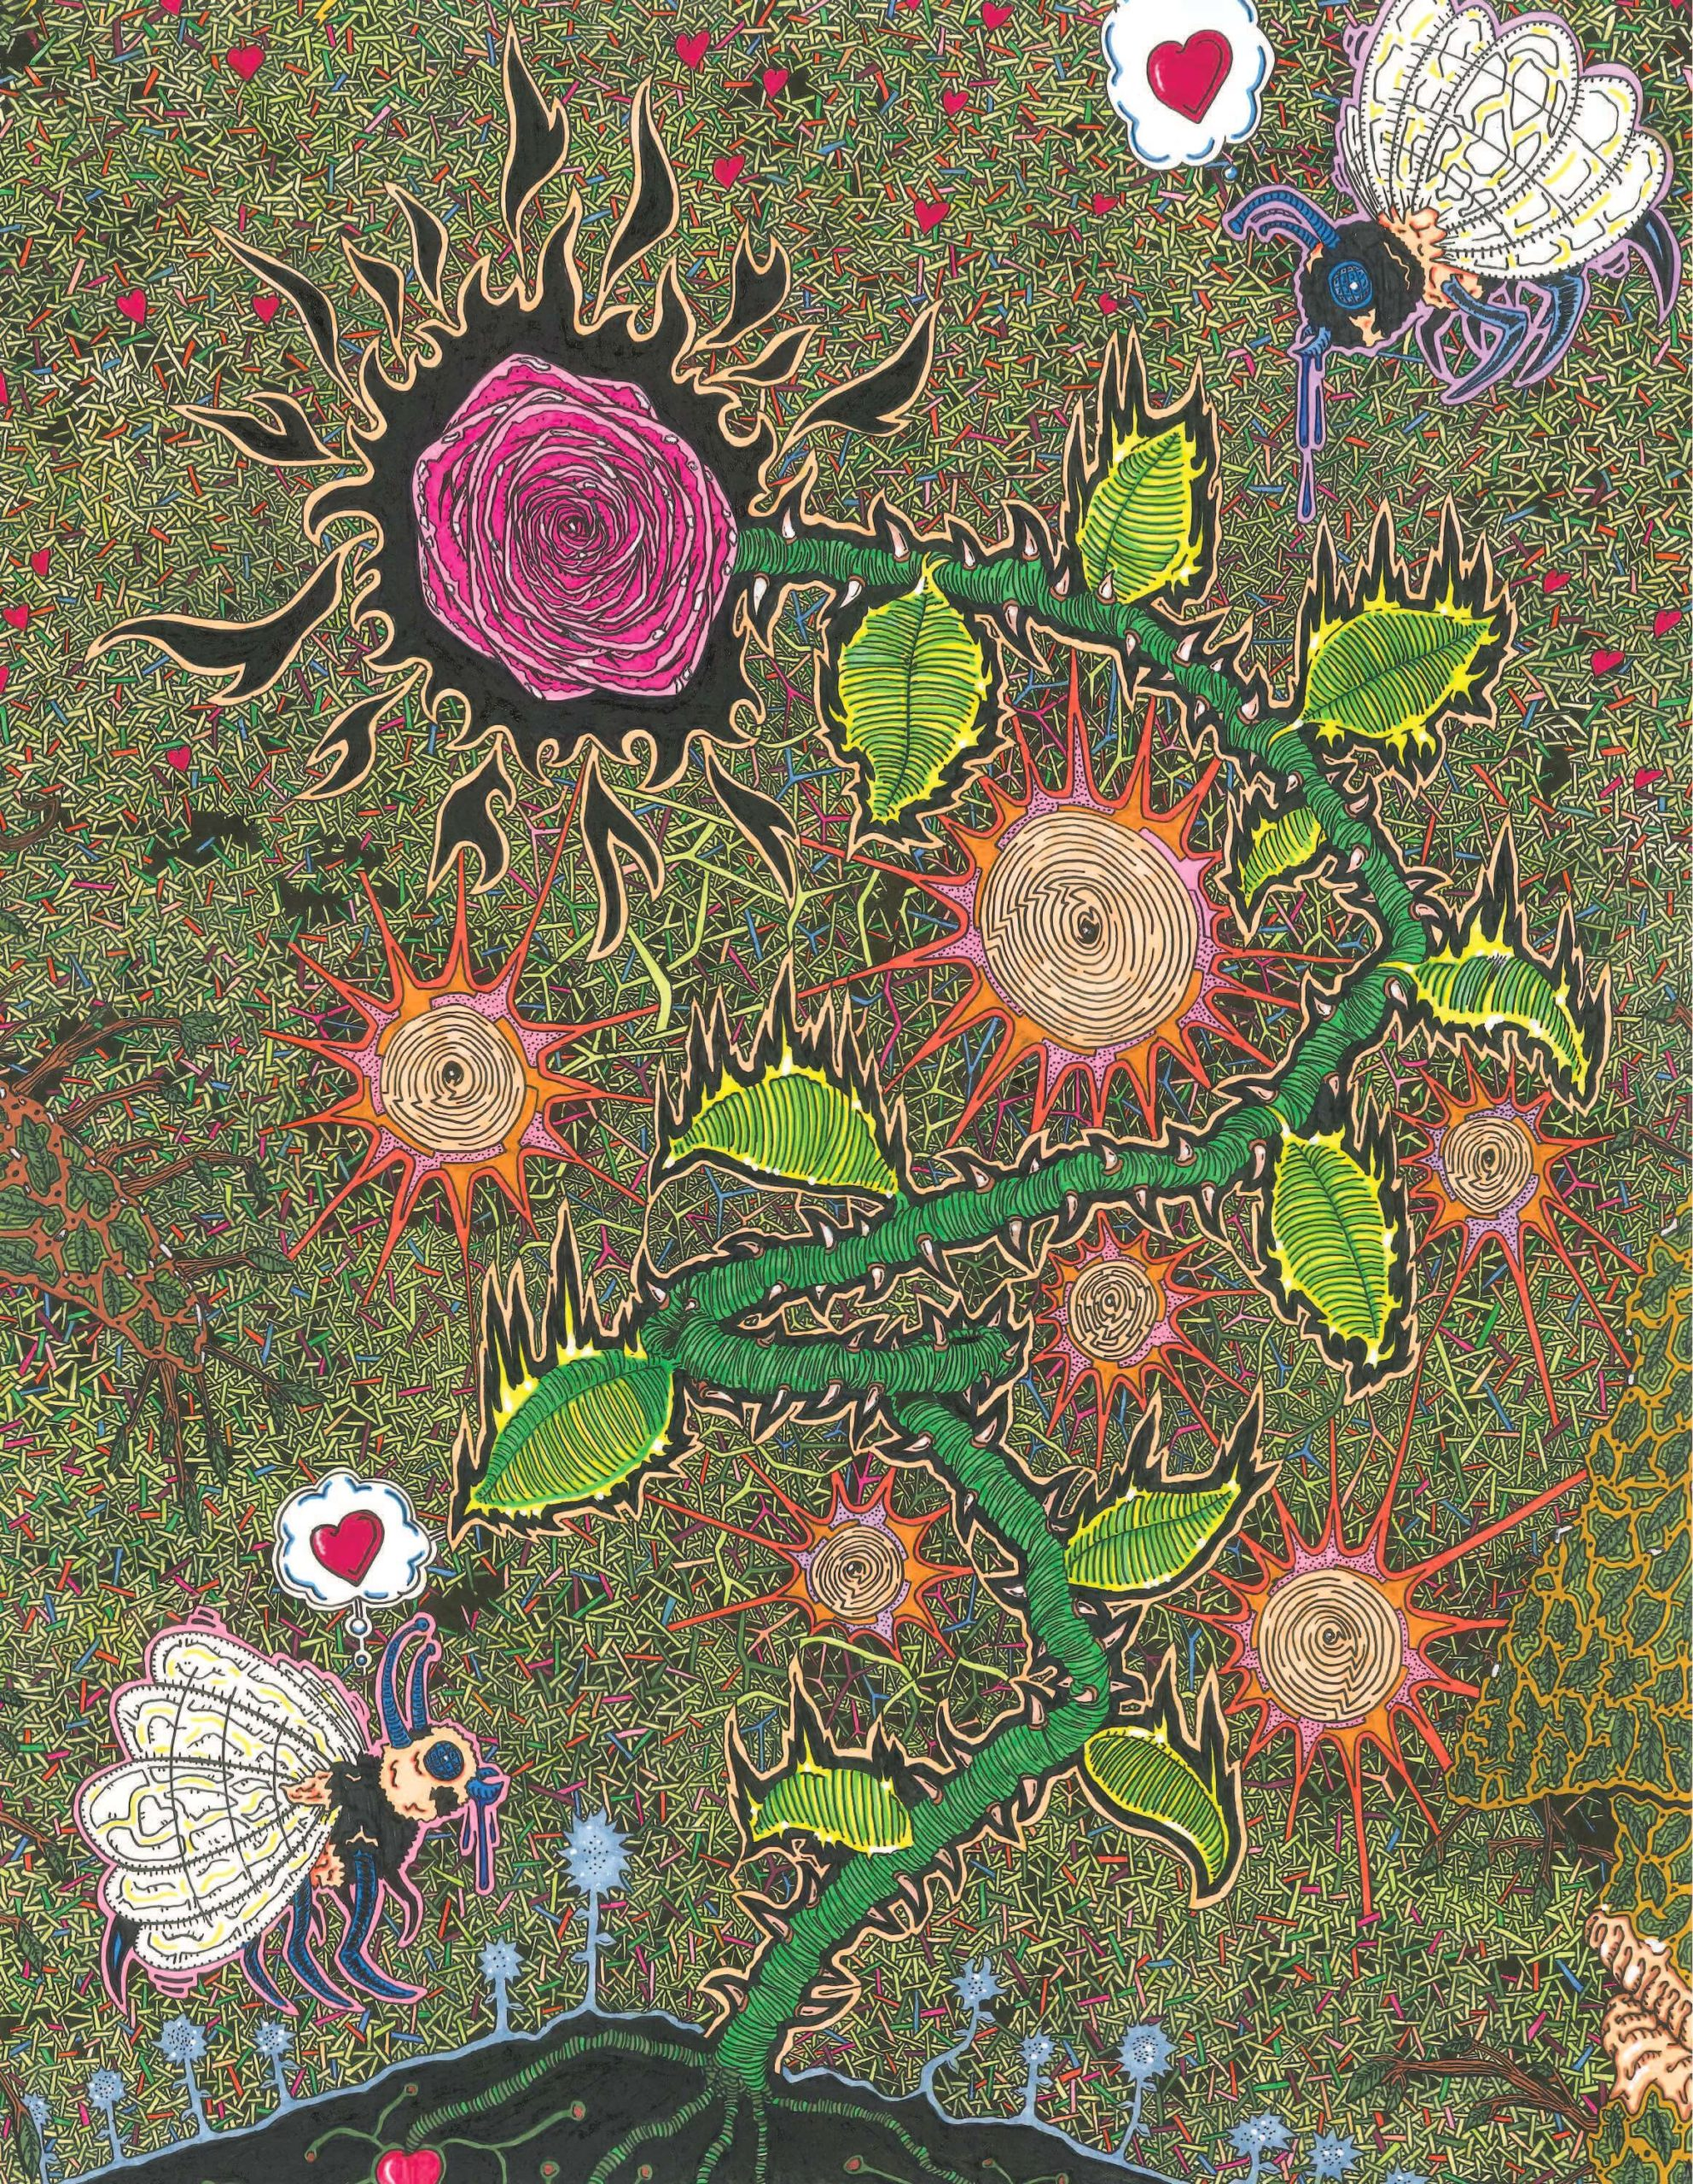 Steve Jebbett - Drooling over the Petals